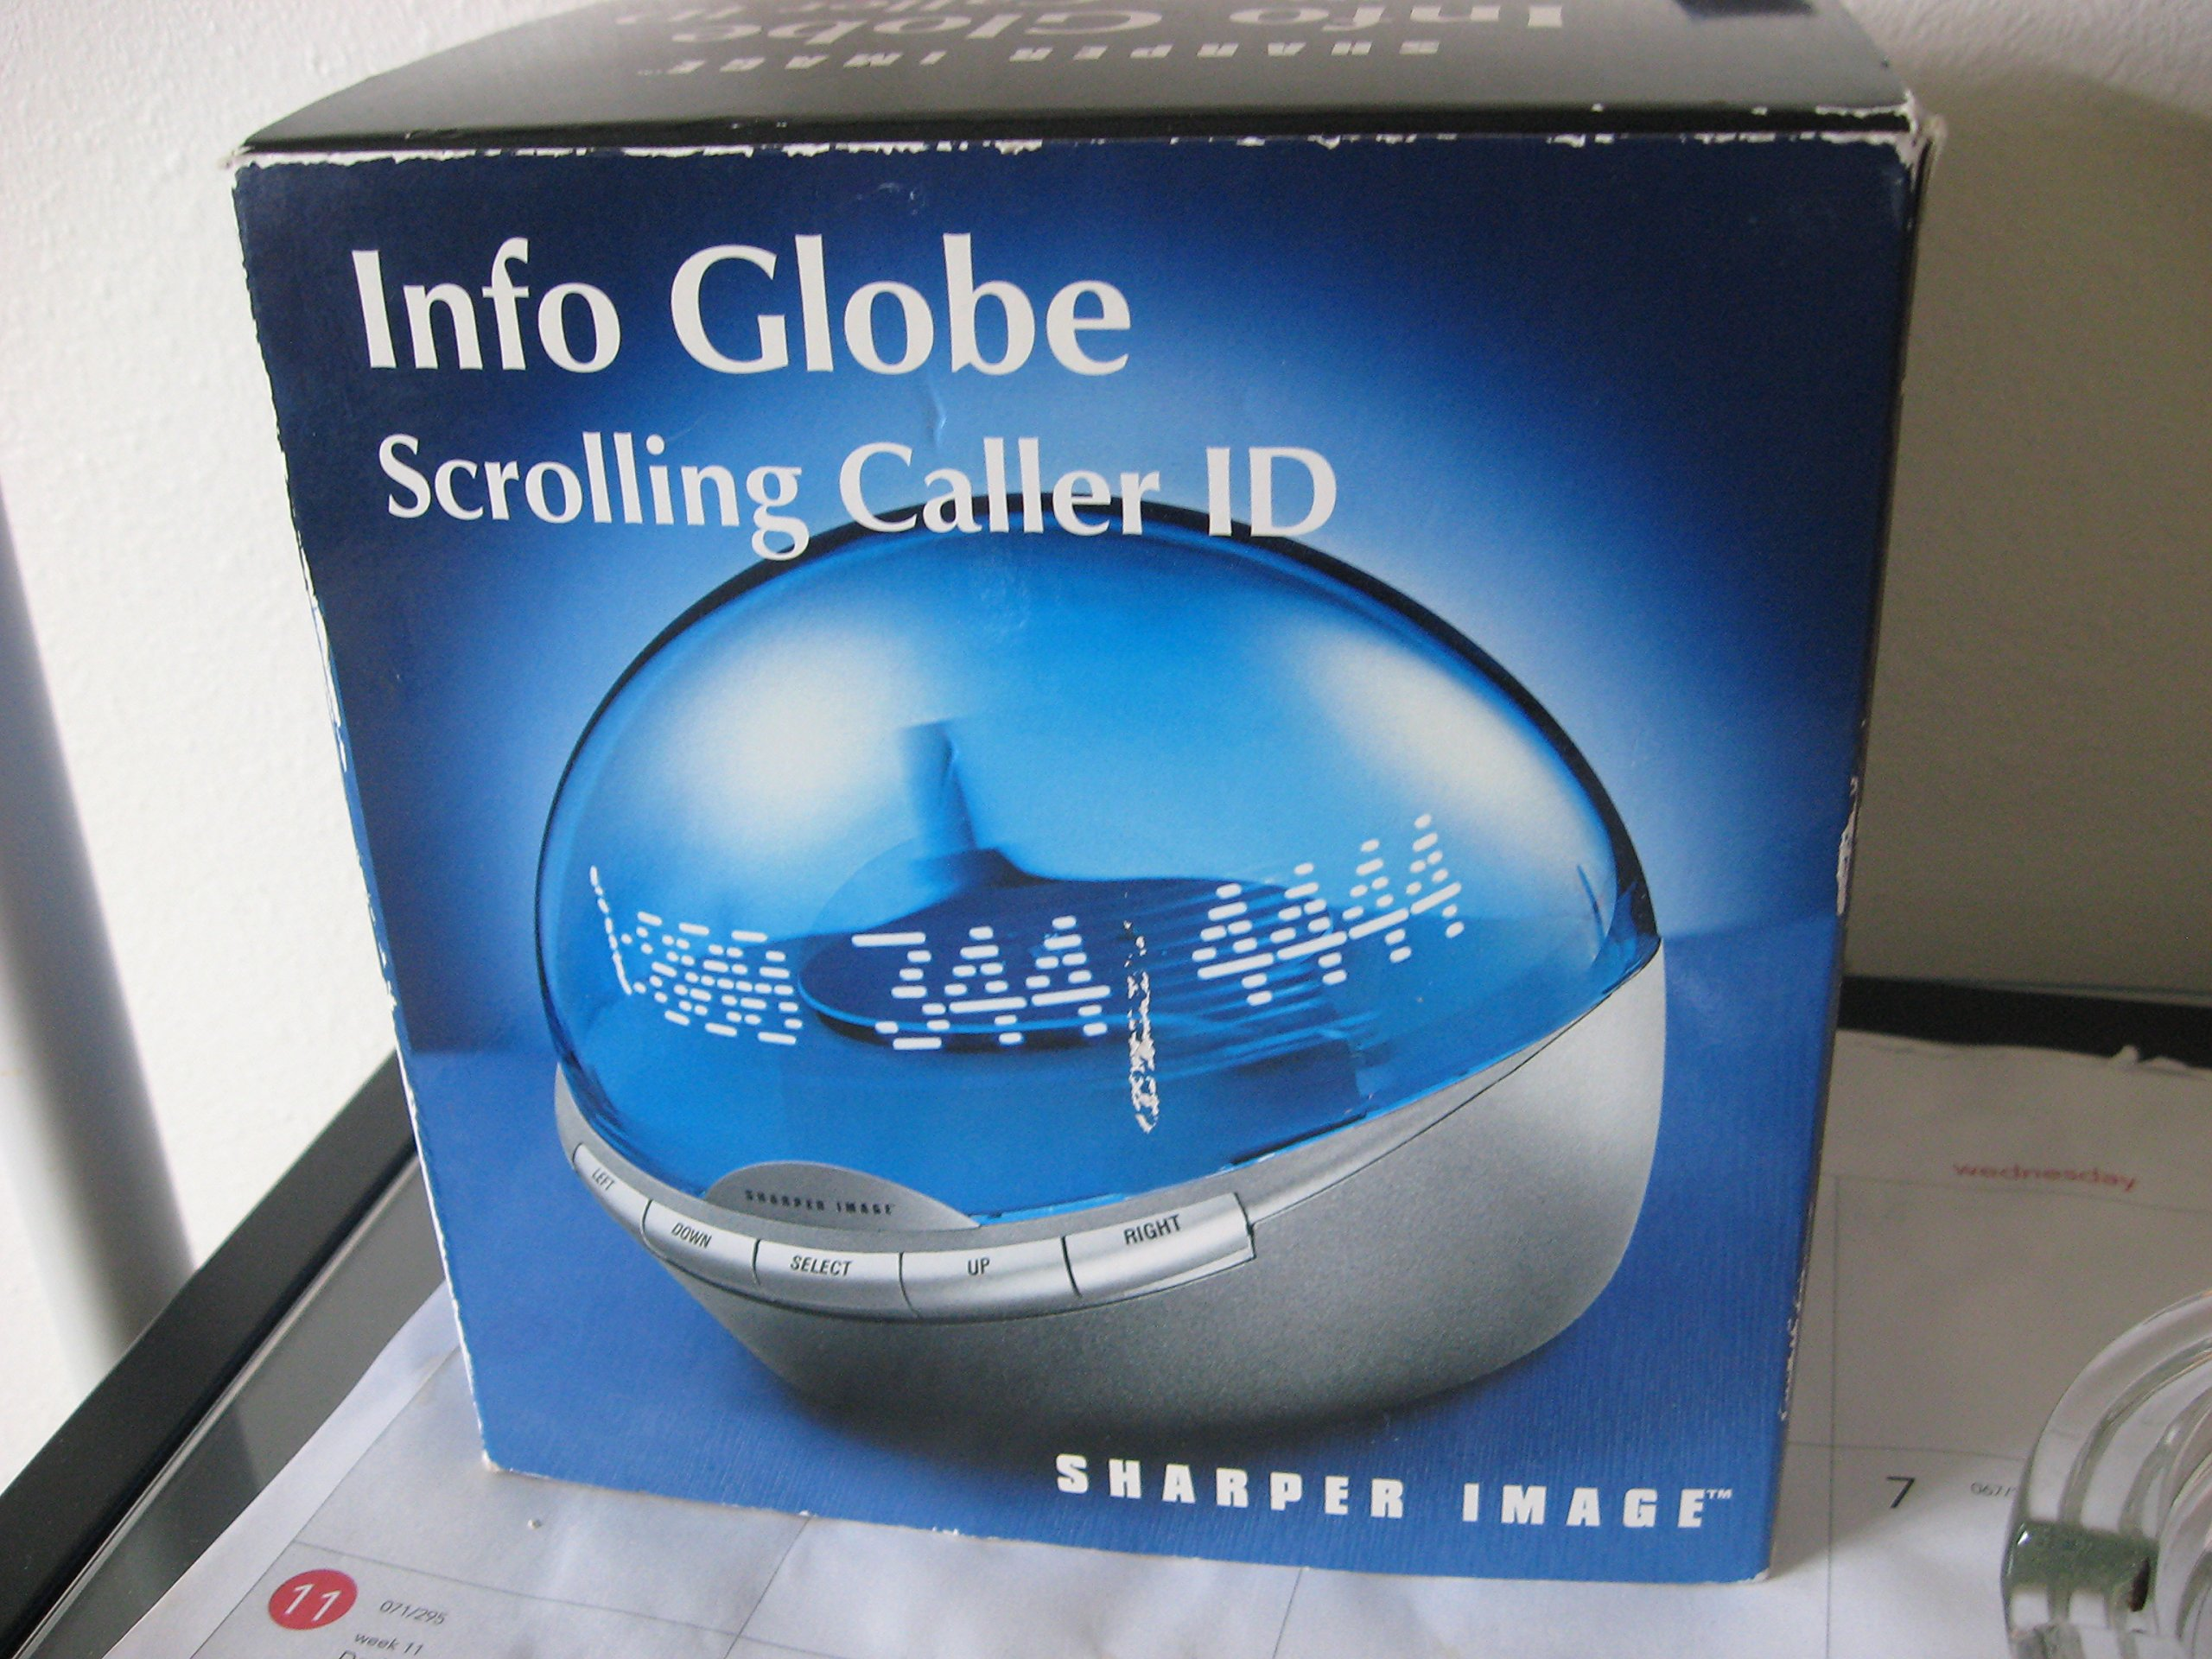 Sharper Image Info Globe Scrolling Caller ID by Sharper Image